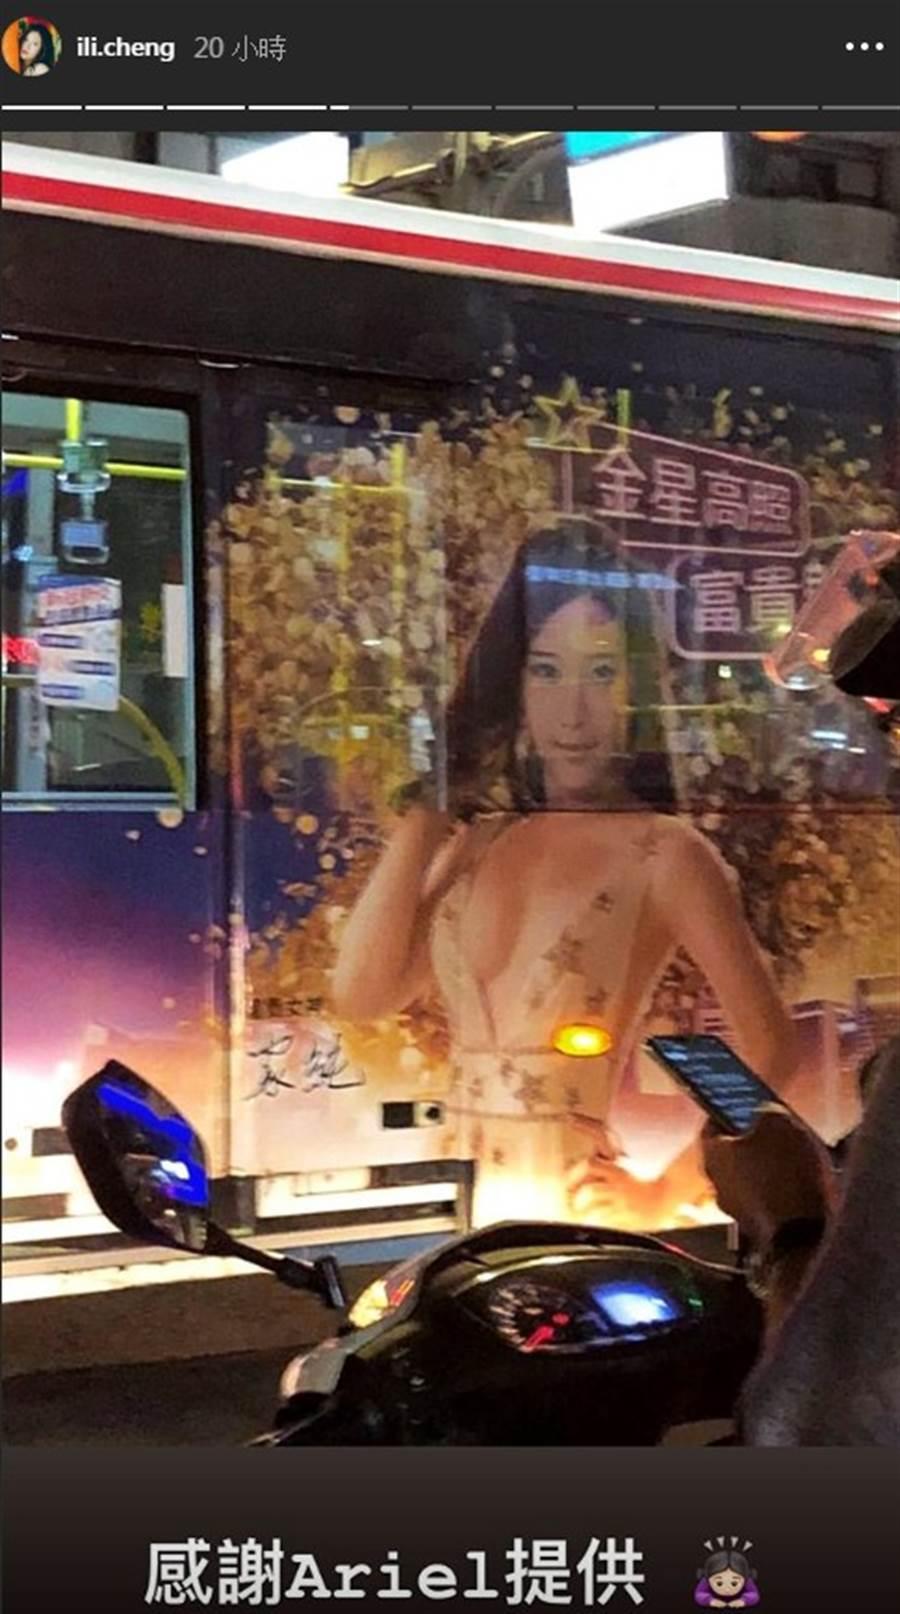 網友拍下雞排妹的公車廣告。(圖/IG@ili.cheng)